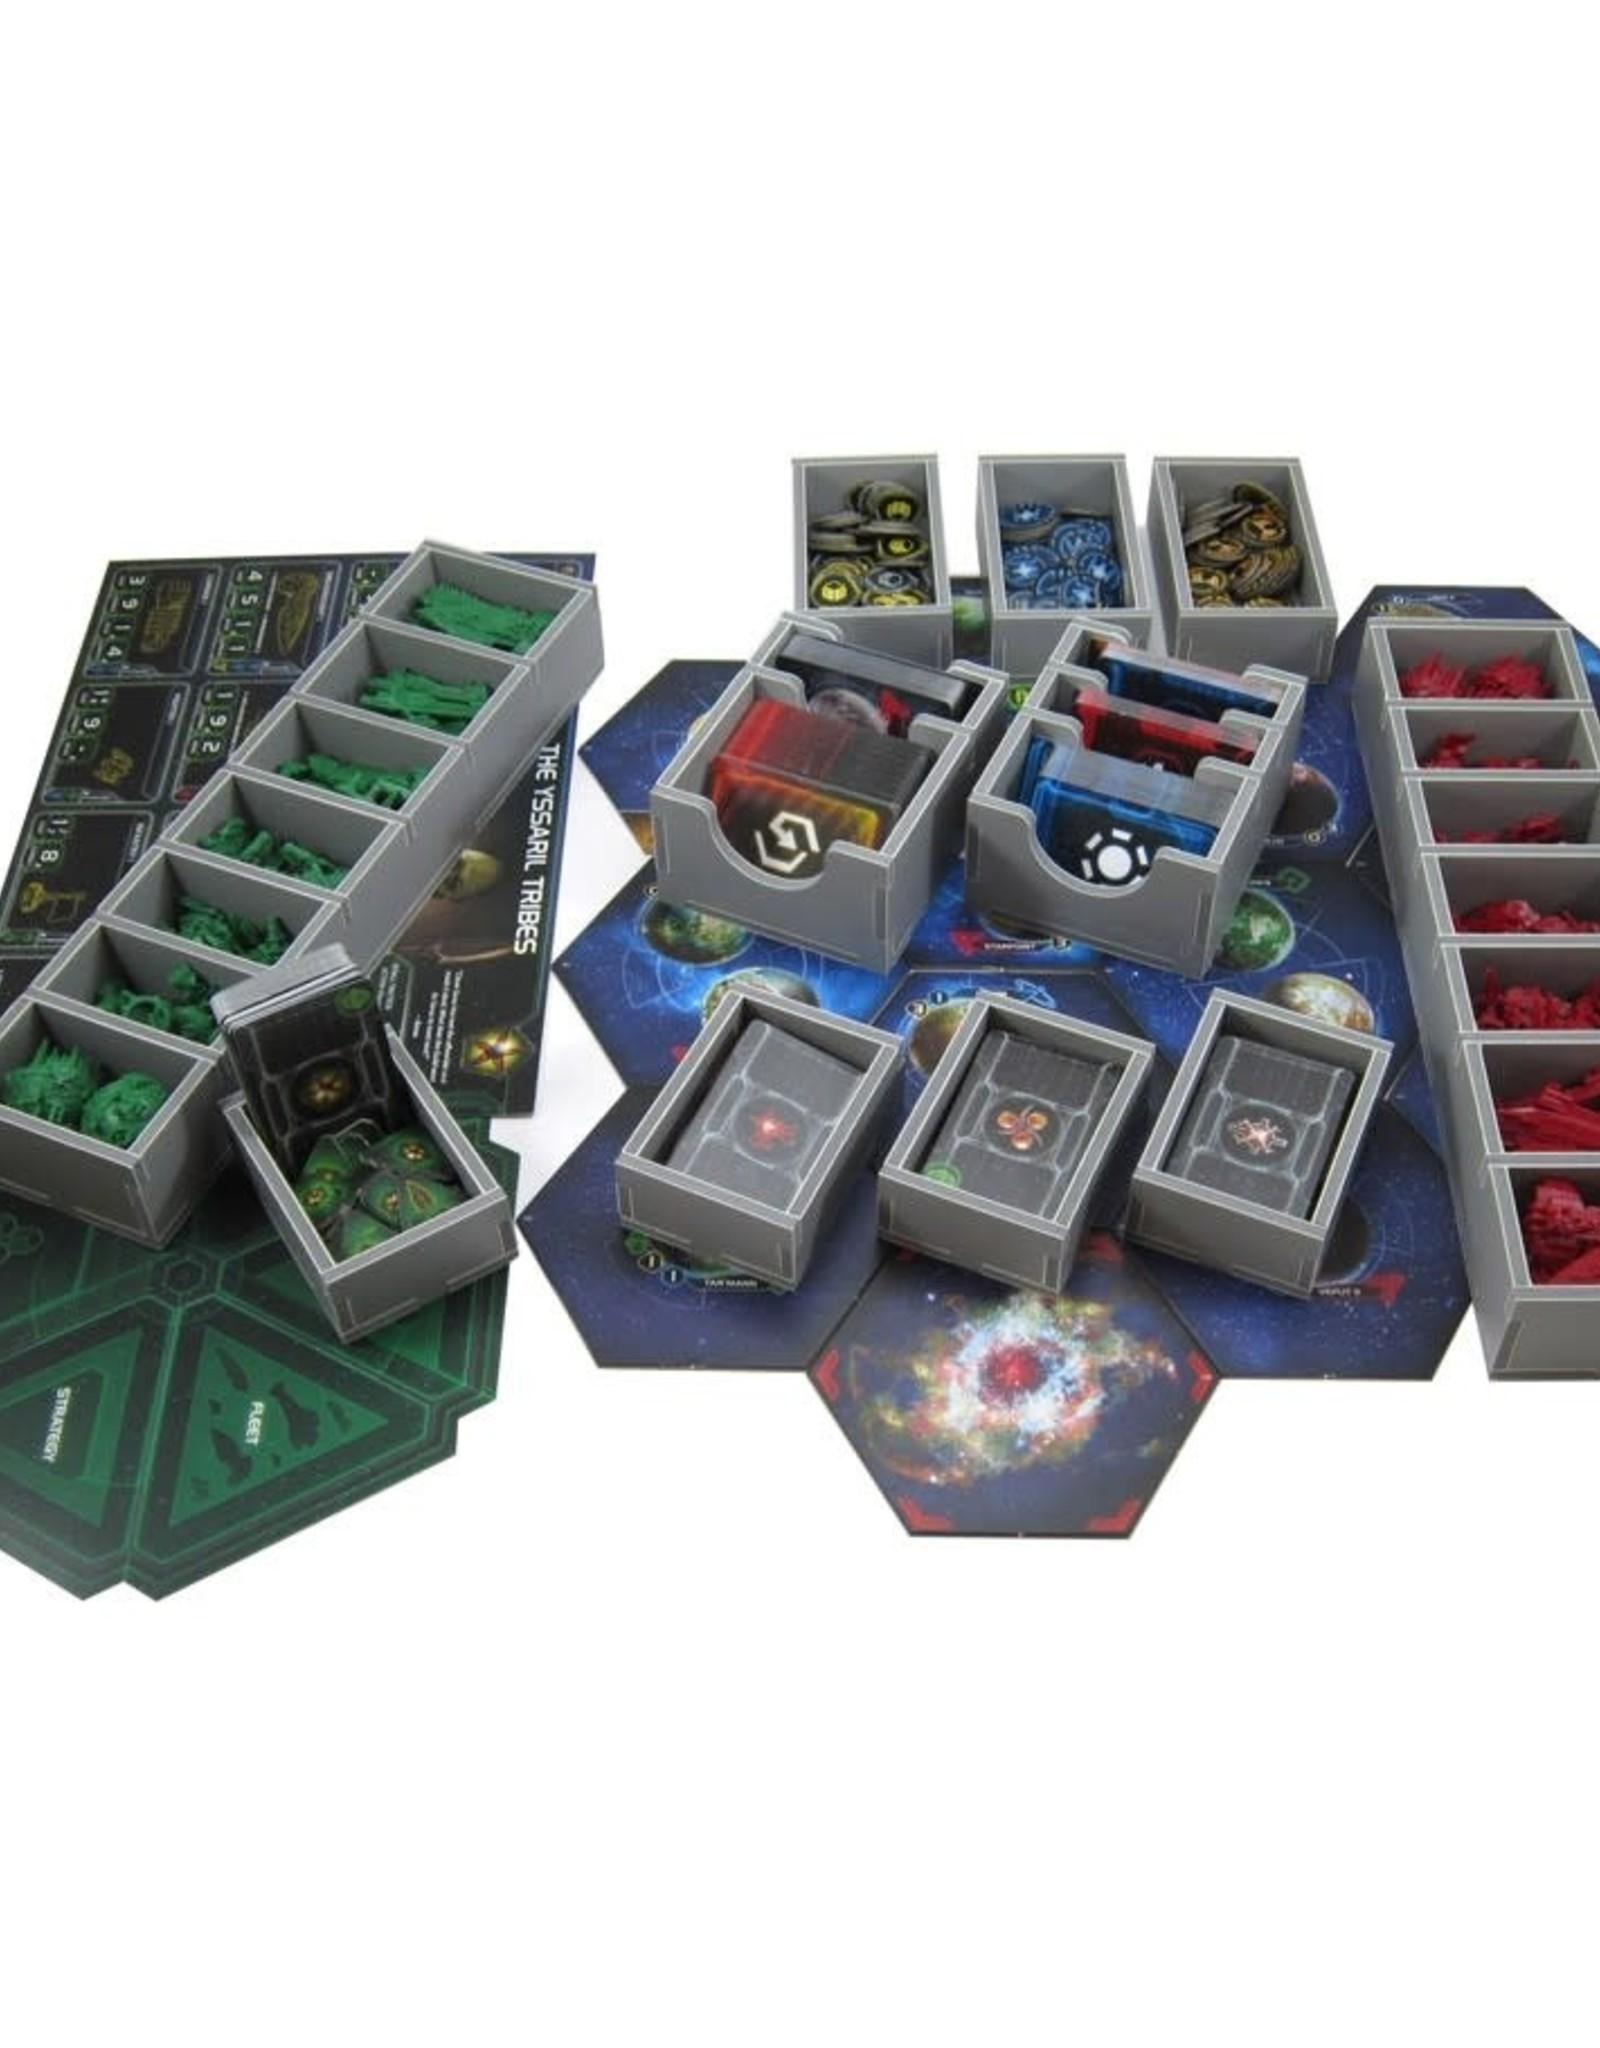 Folded Space Box Insert: Twilight Imperium 4 & Exps